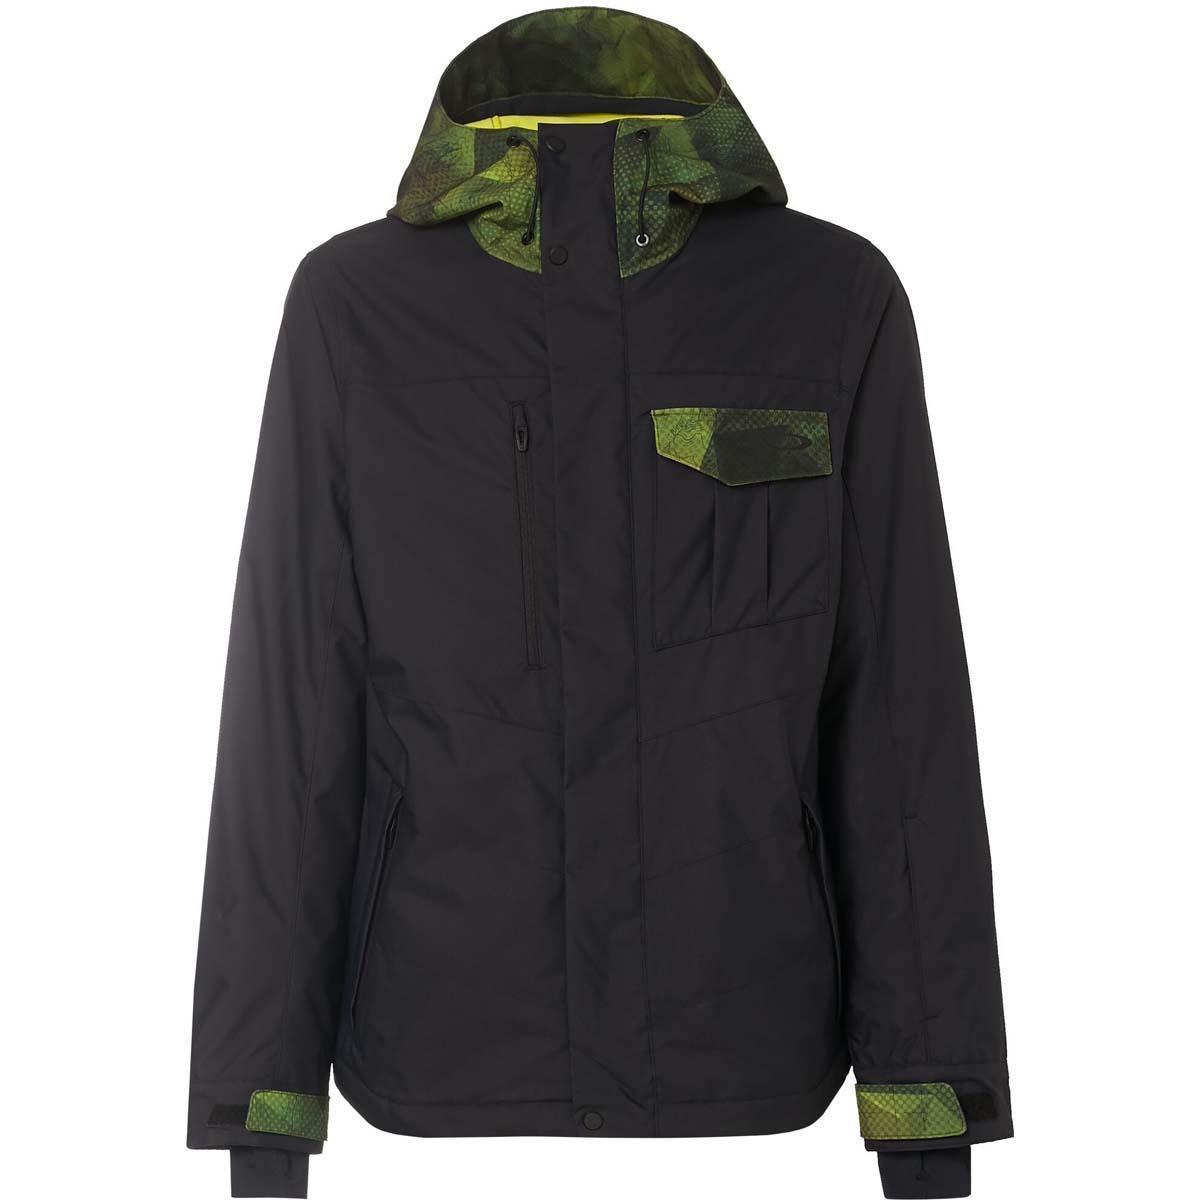 Oakley Division Insula Jacket 2L 10K Men's